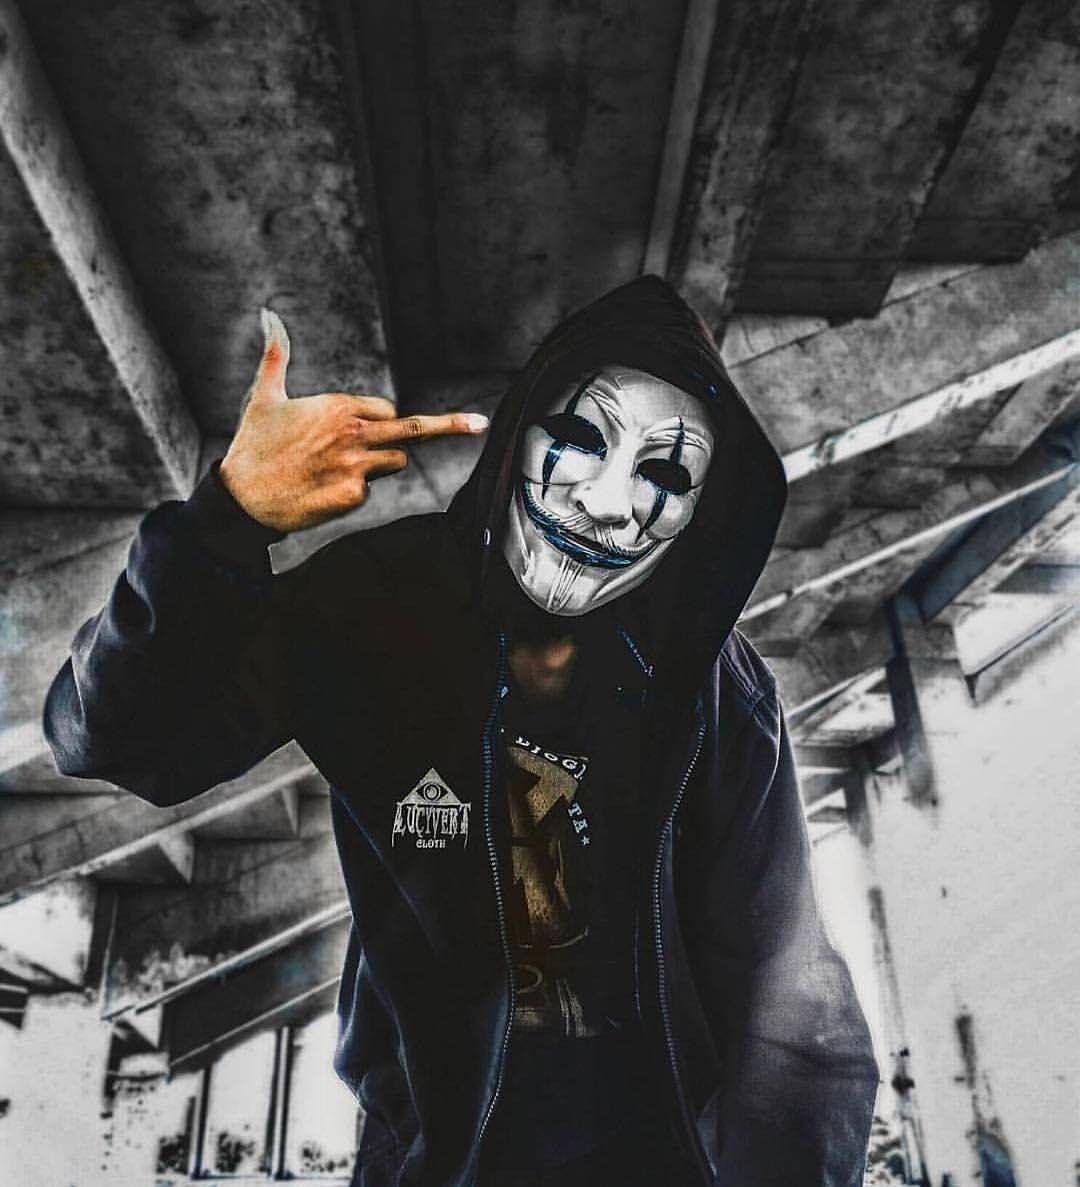 Pin by Dragan on Tattoo Joker hd wallpaper, Smoke